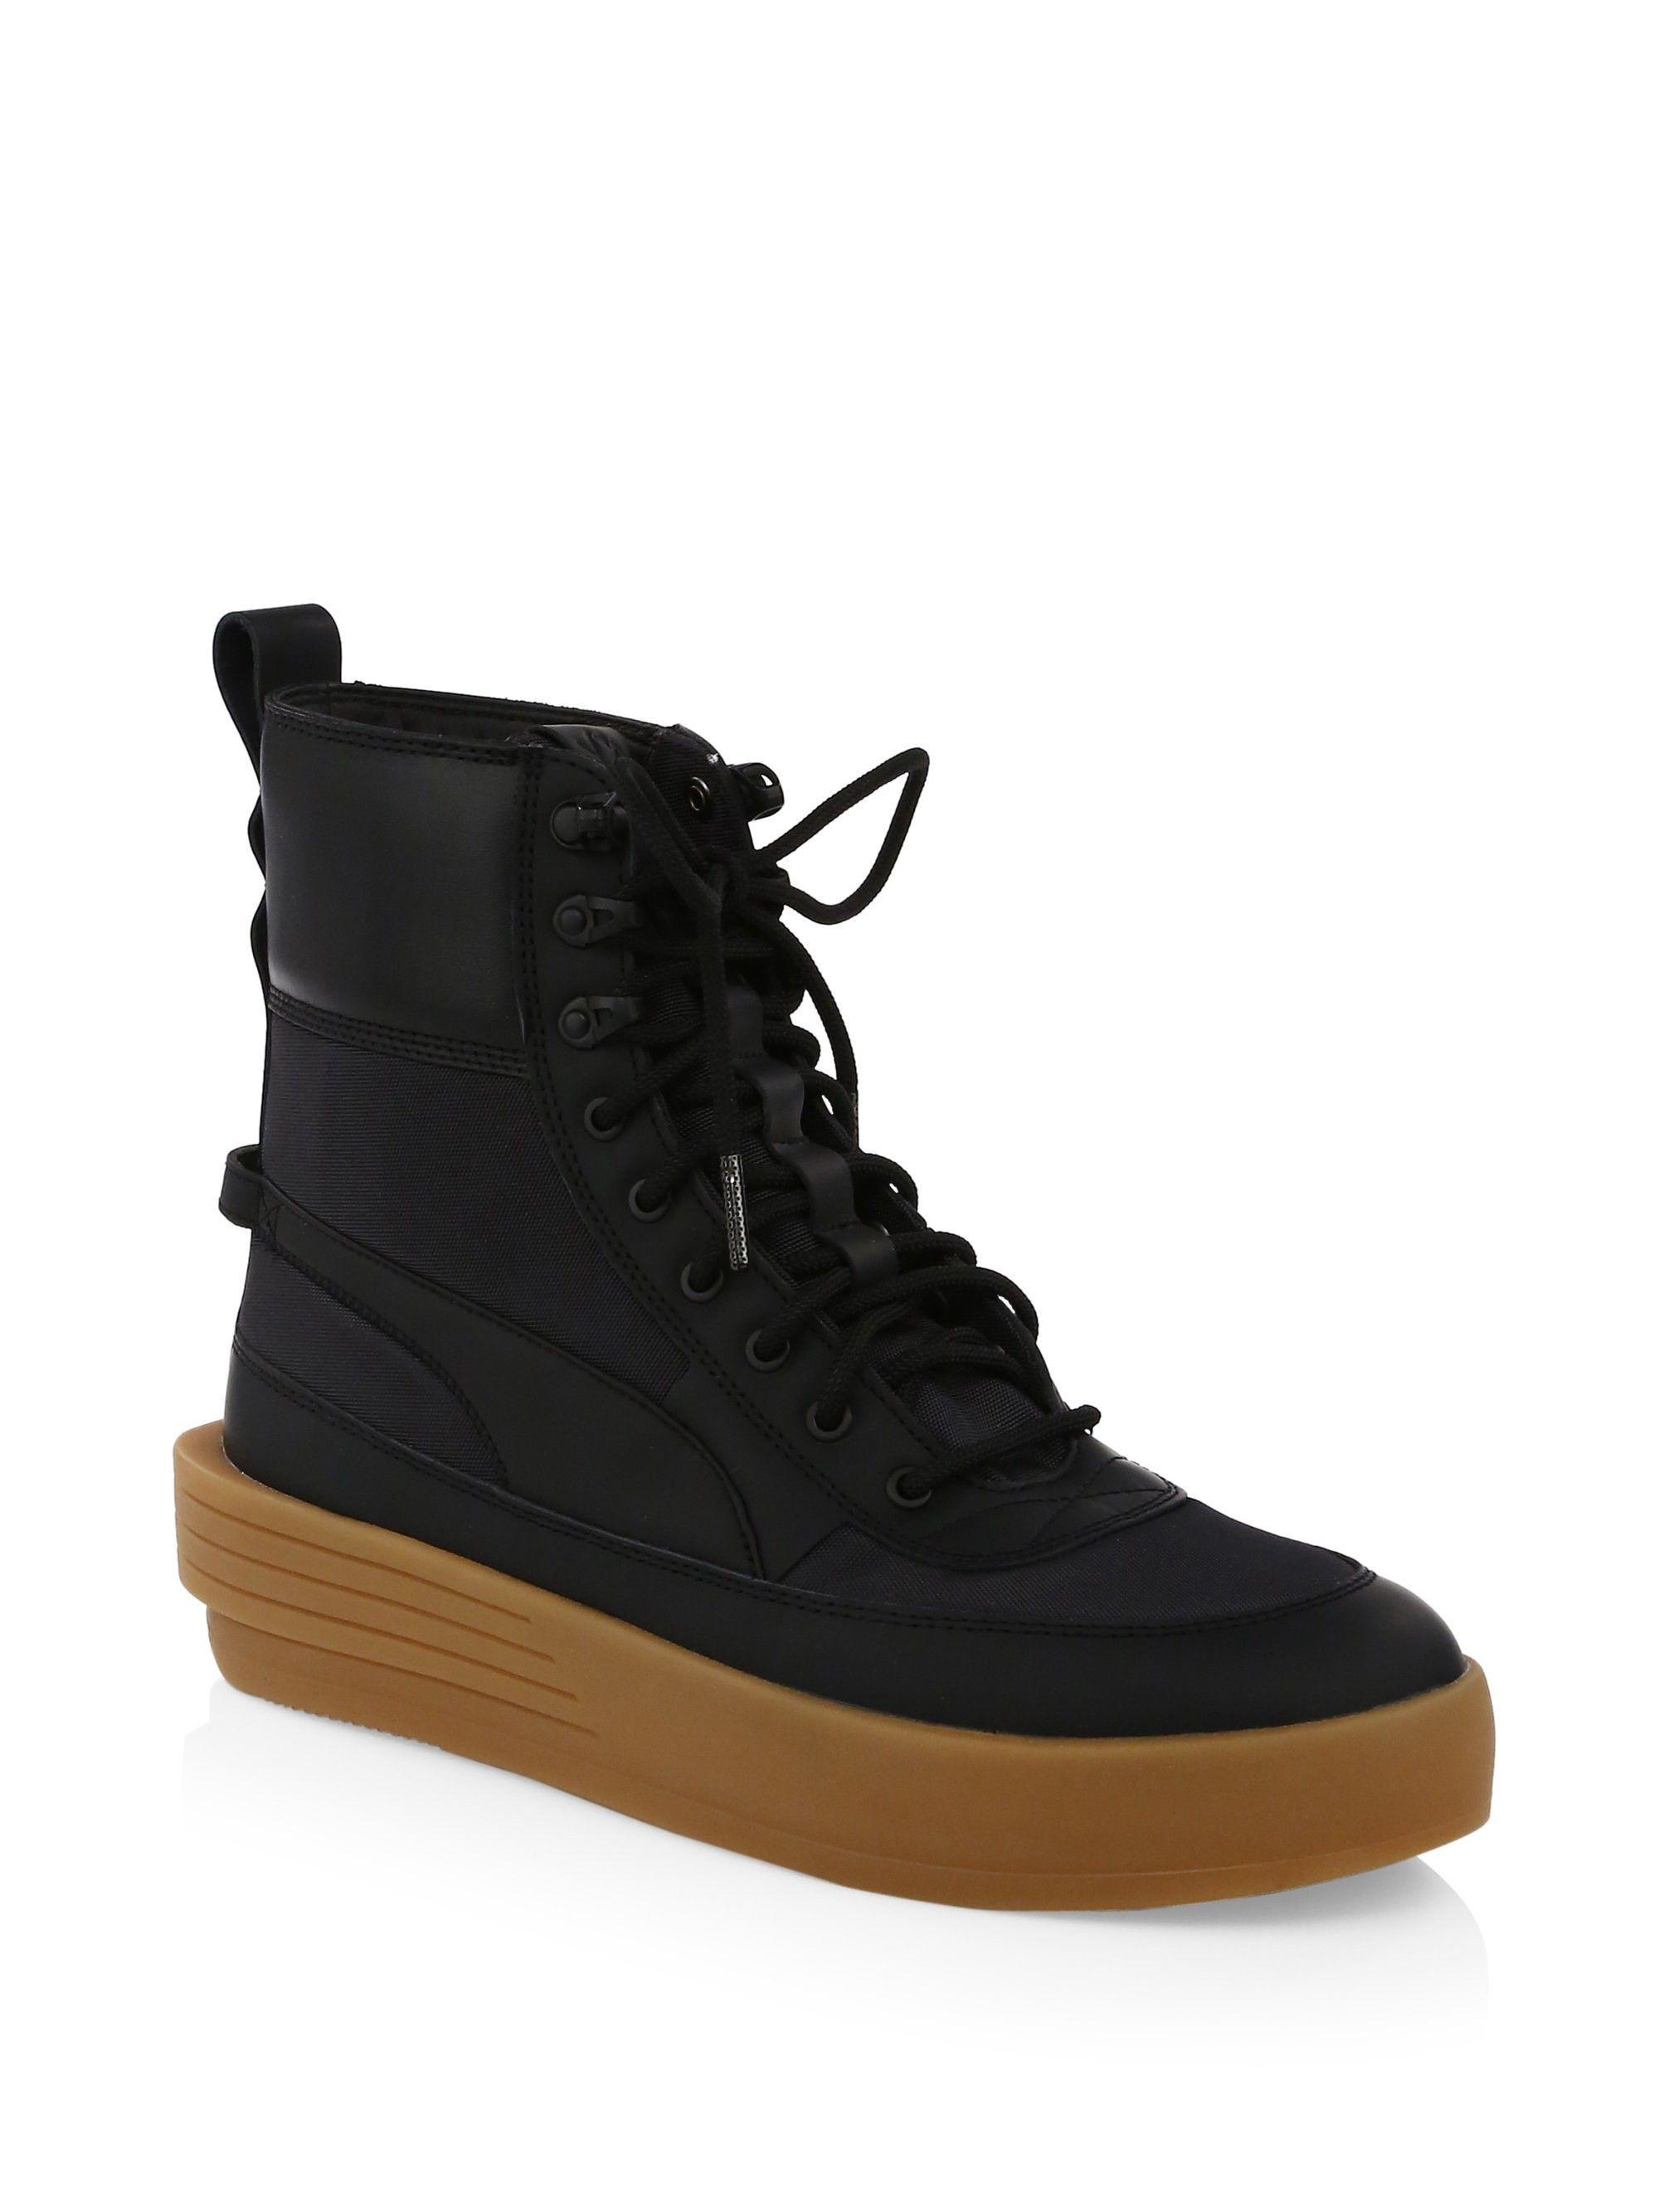 Puma Xo Parallel High-Top Sneakers - Black 10.5 d42ac4252